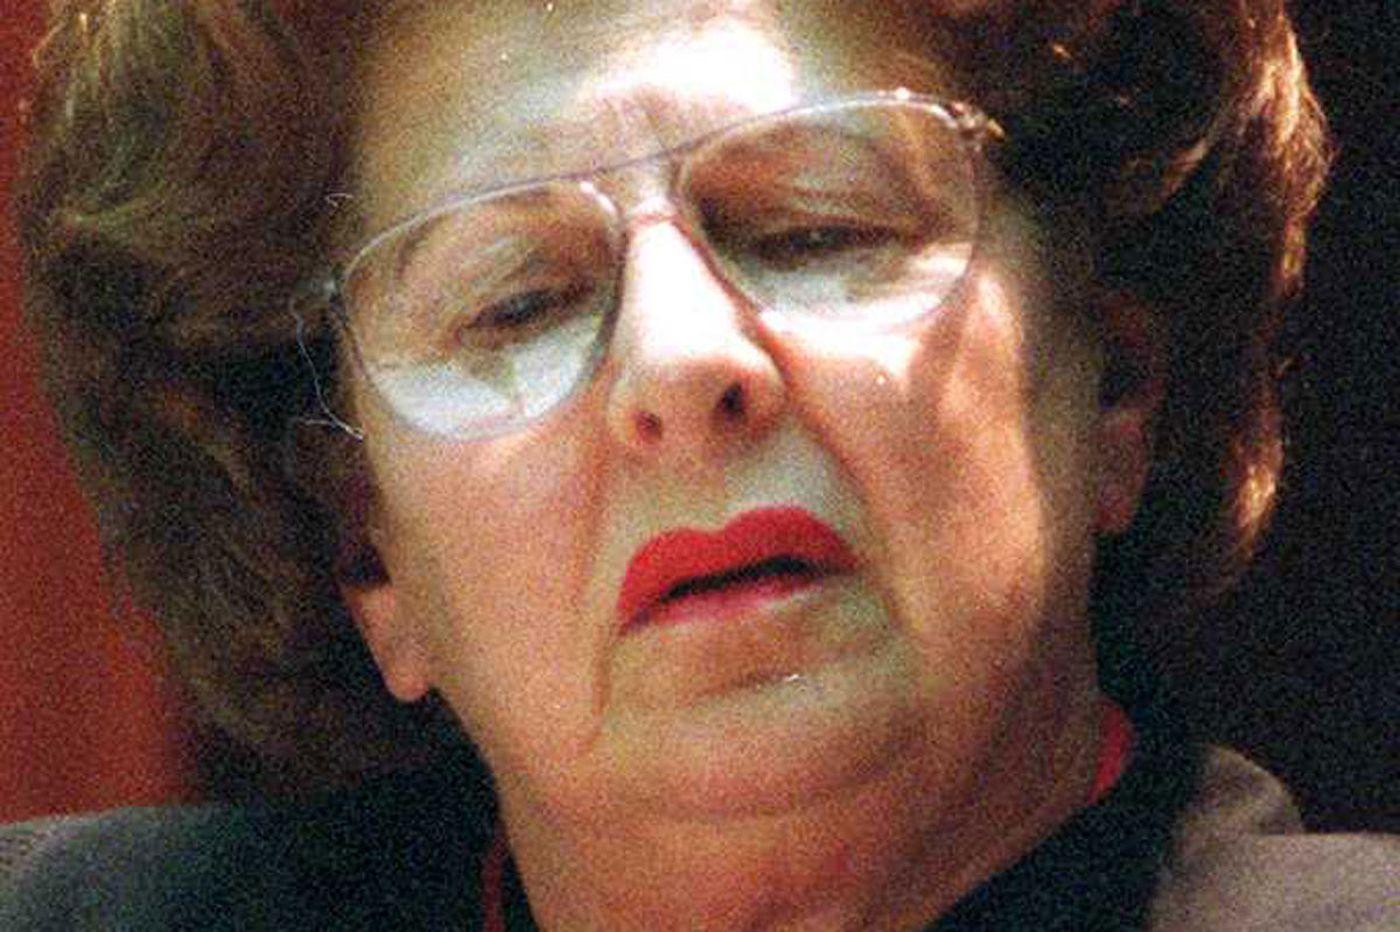 U.S. District Senior Judge Norma Shapiro, 87